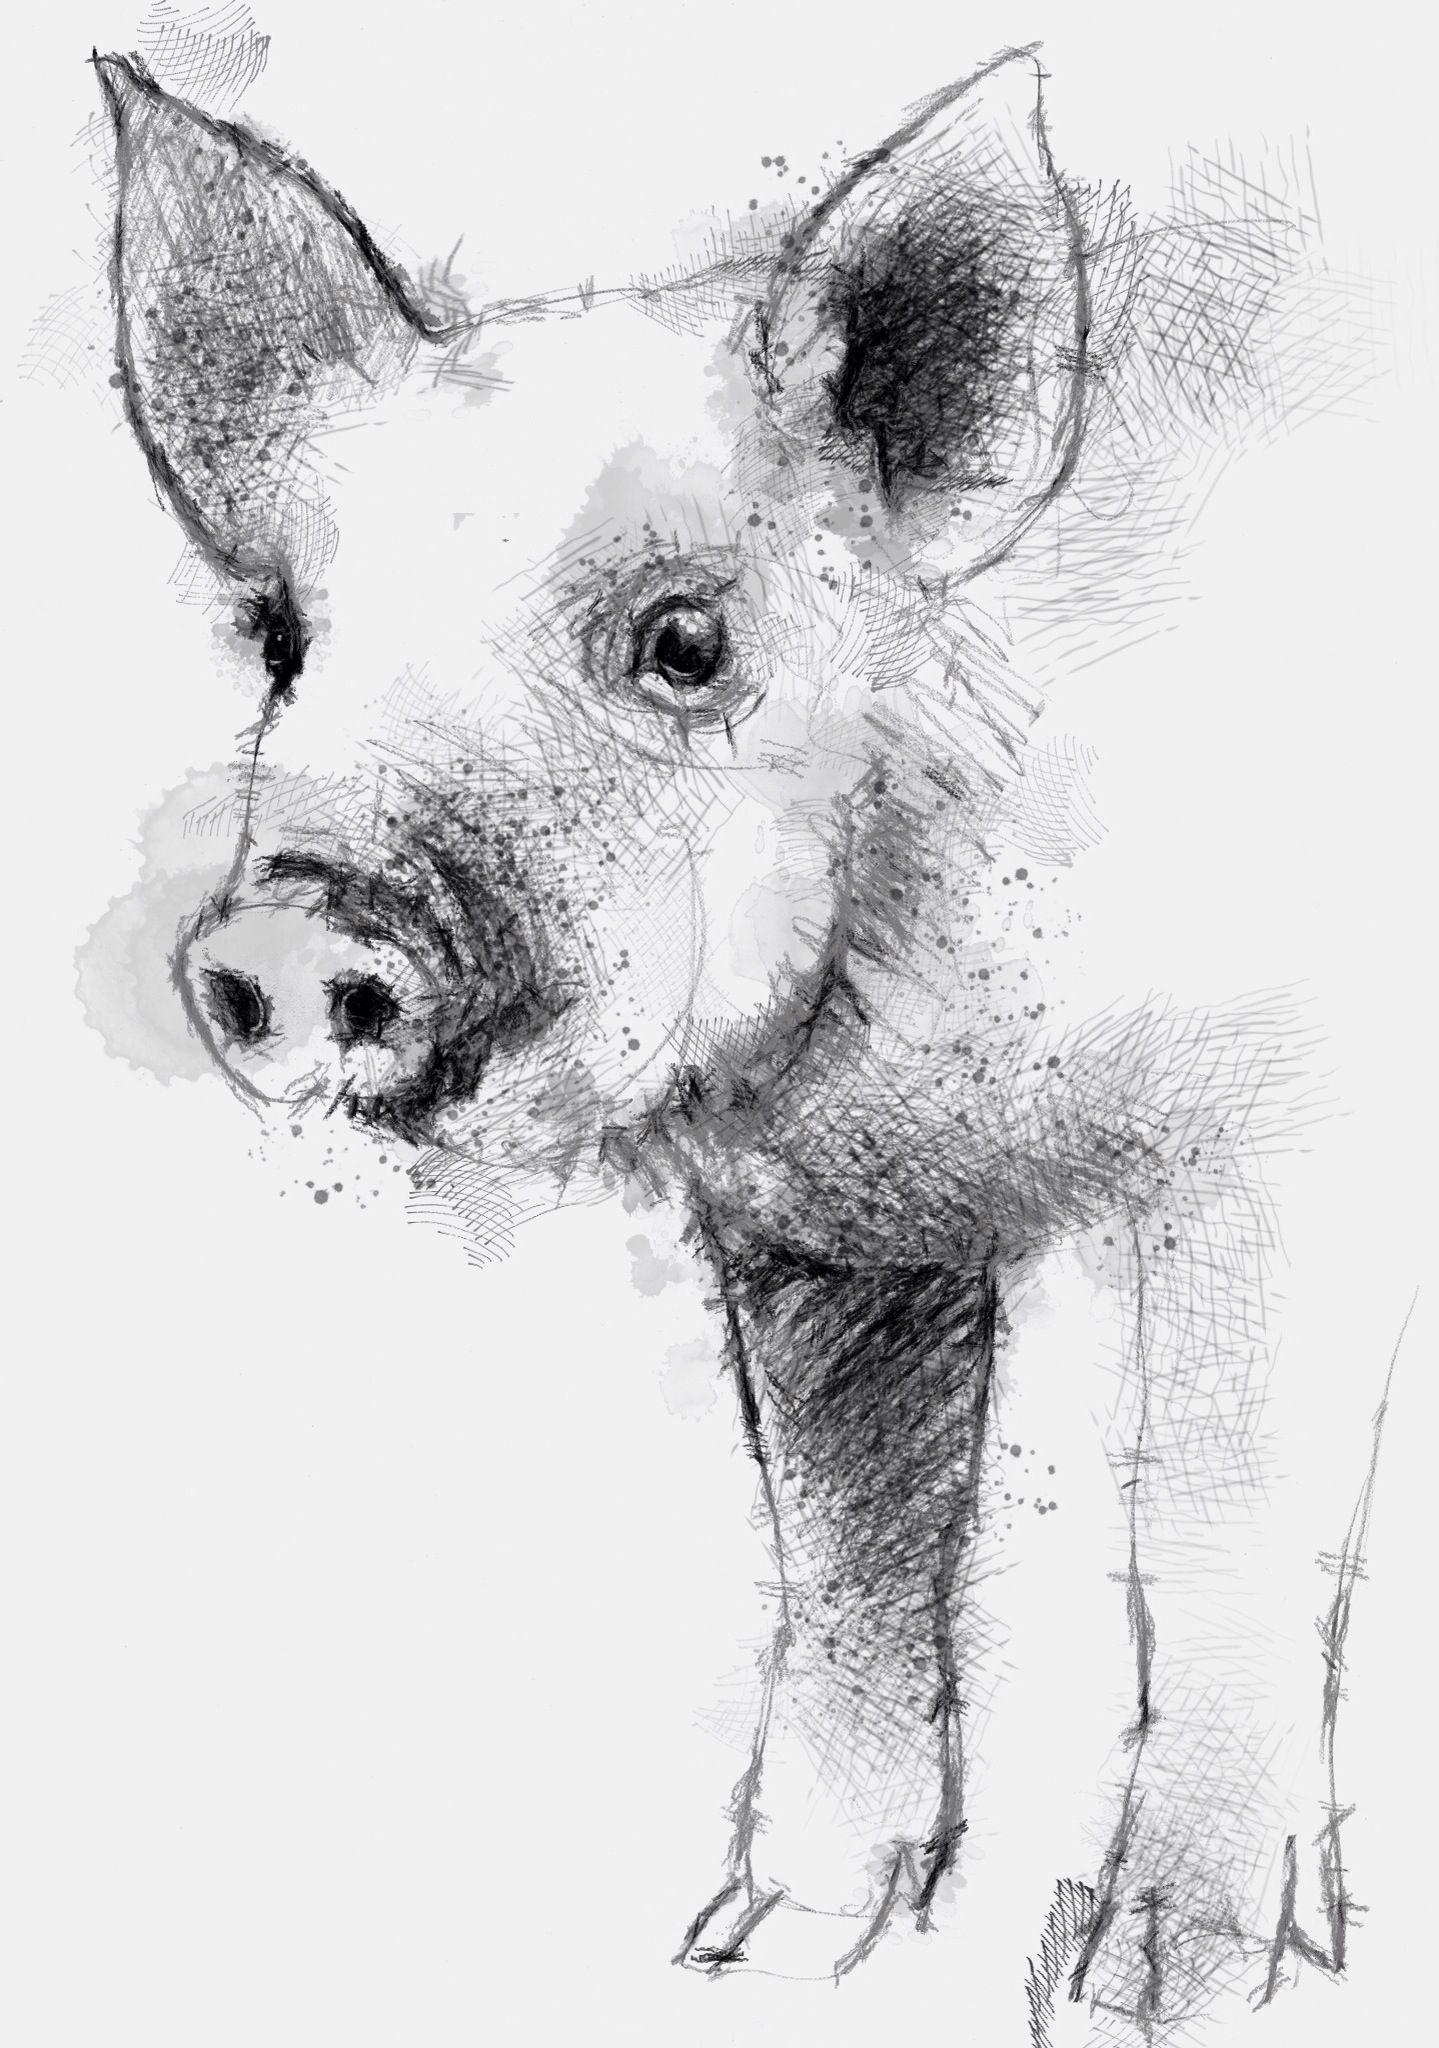 Piglet piirrosmalleja drawings pencil drawings of animals pig